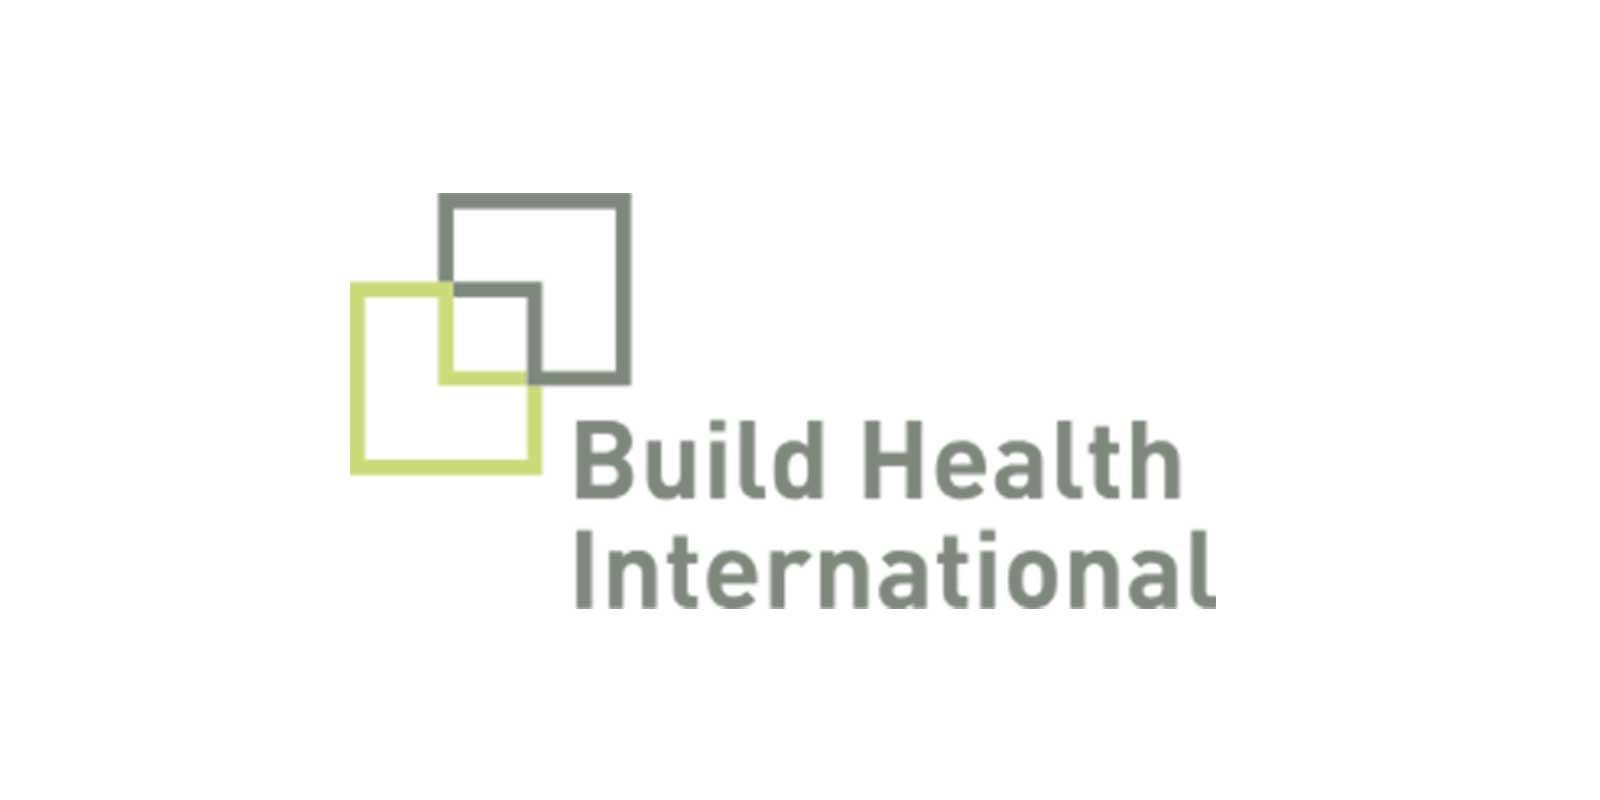 build-health-international-logo